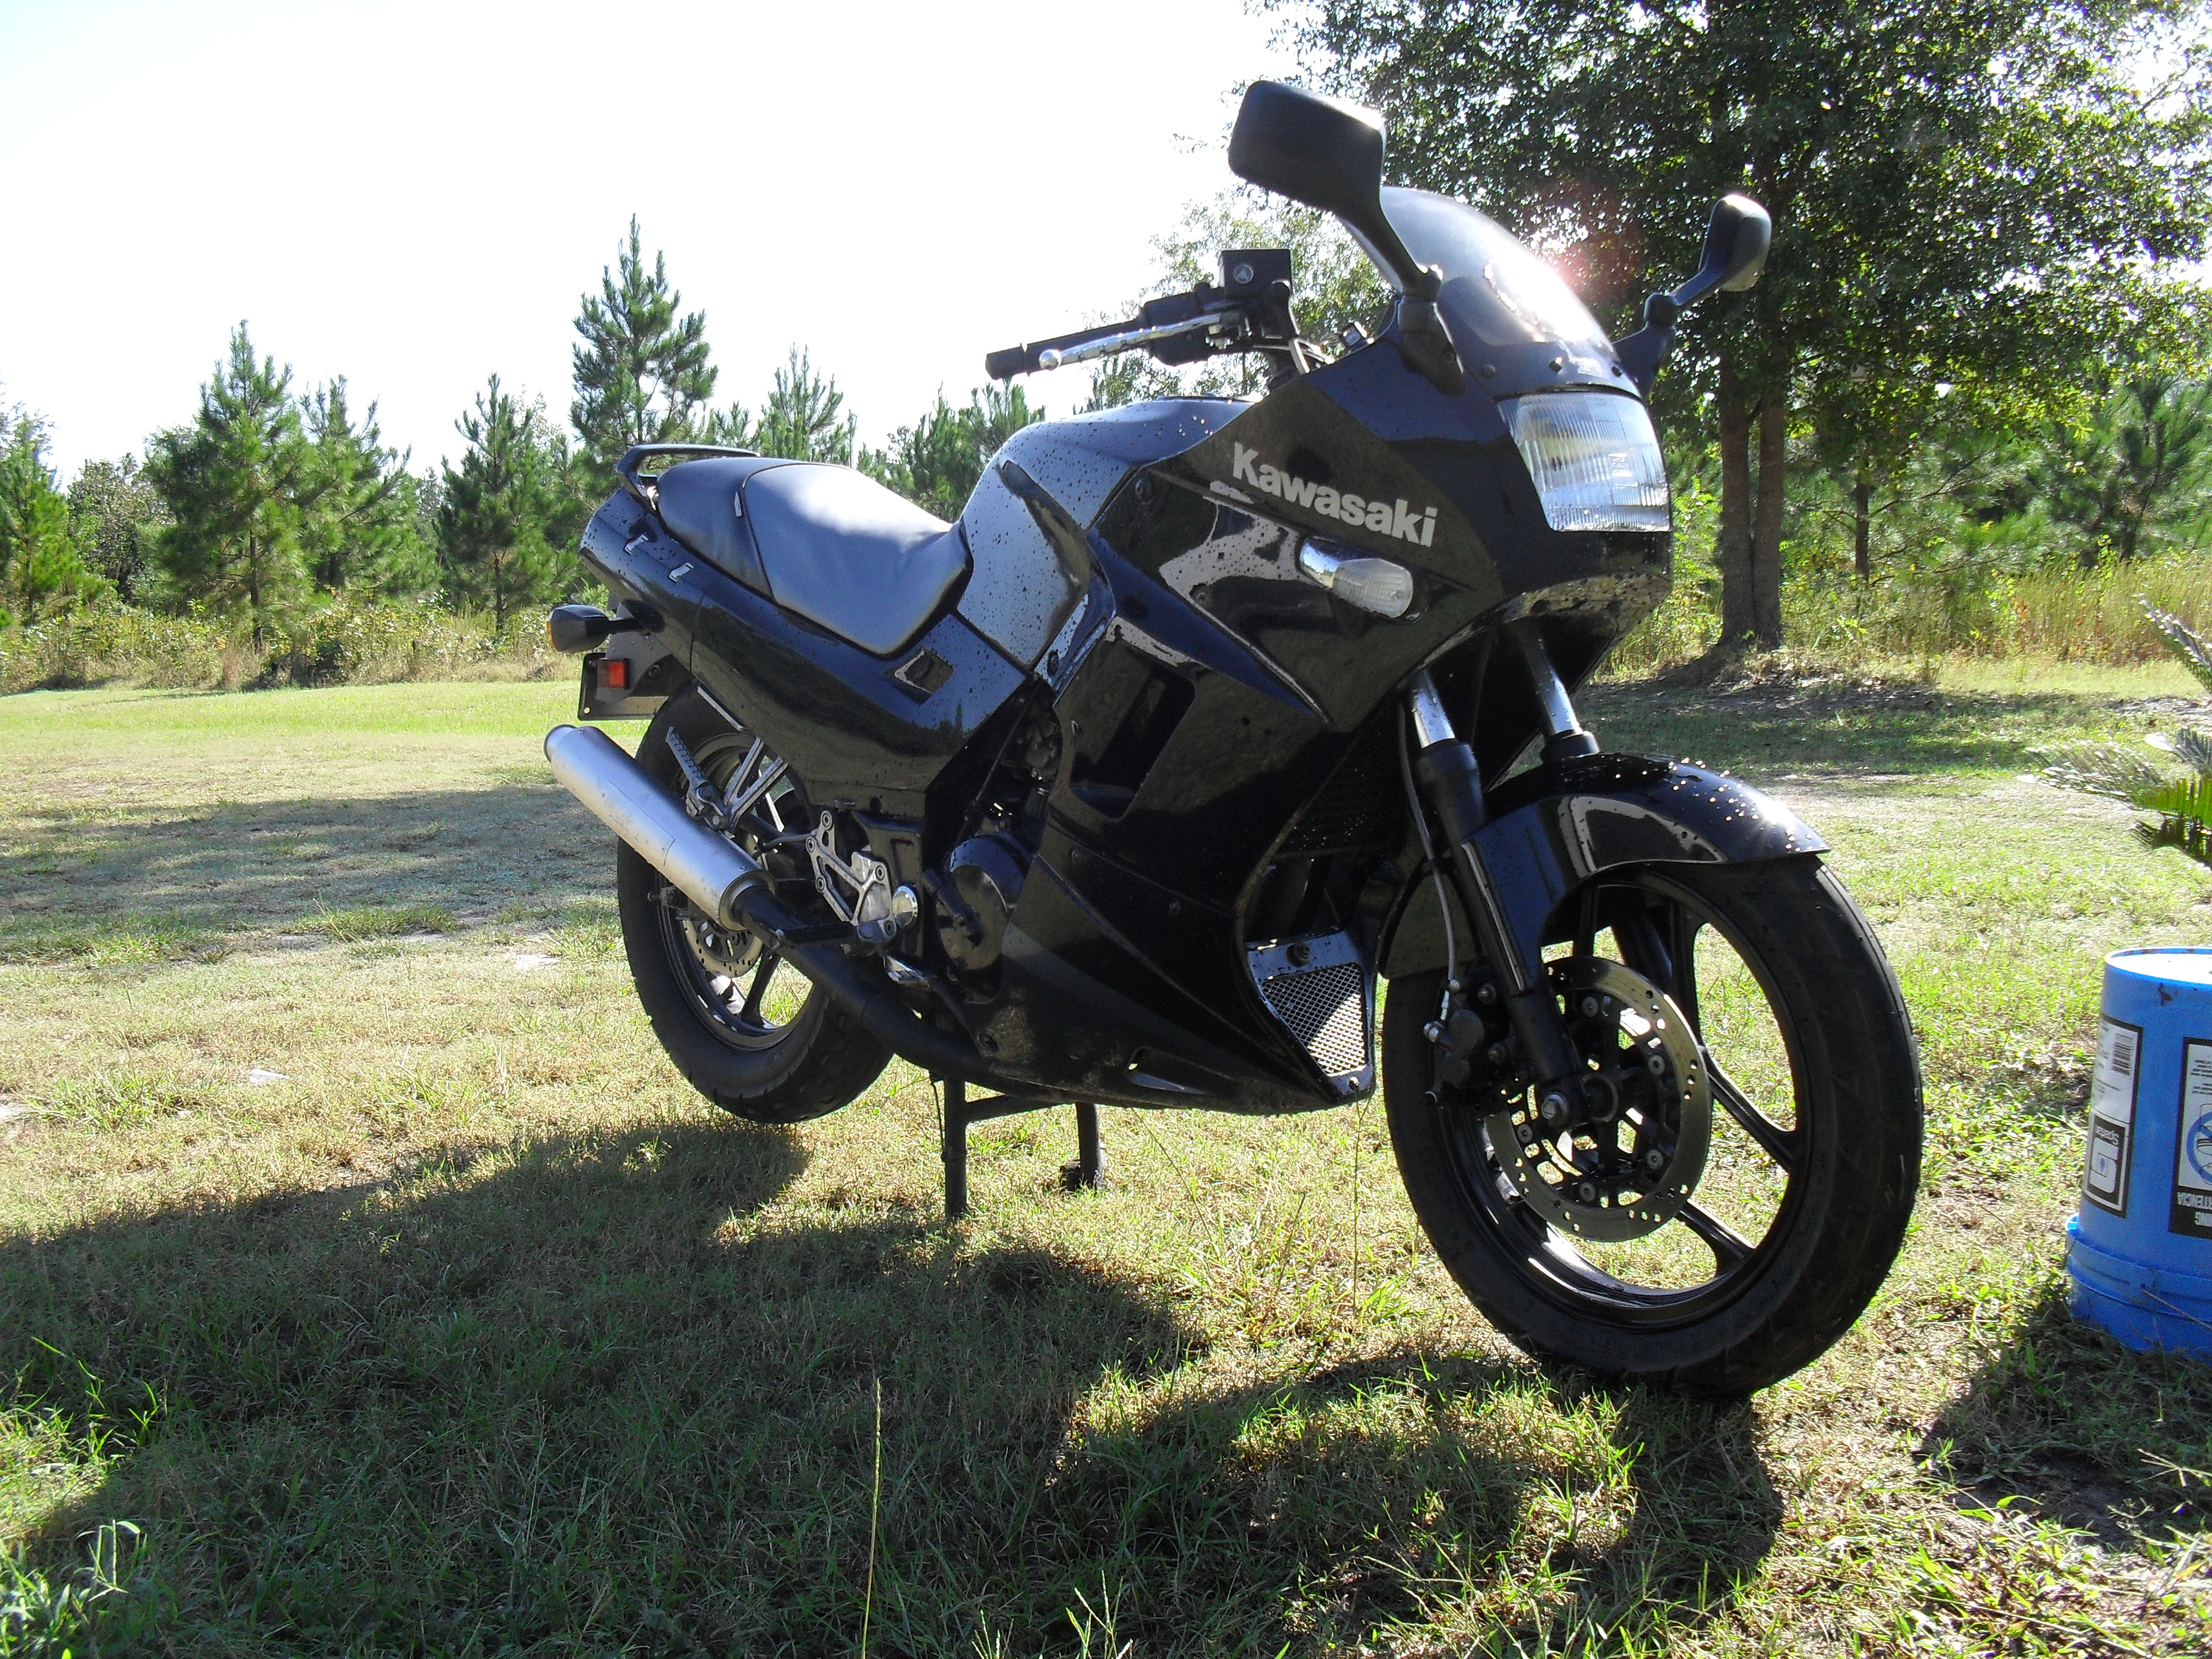 1993 Kawasaki Ninja EX250. '